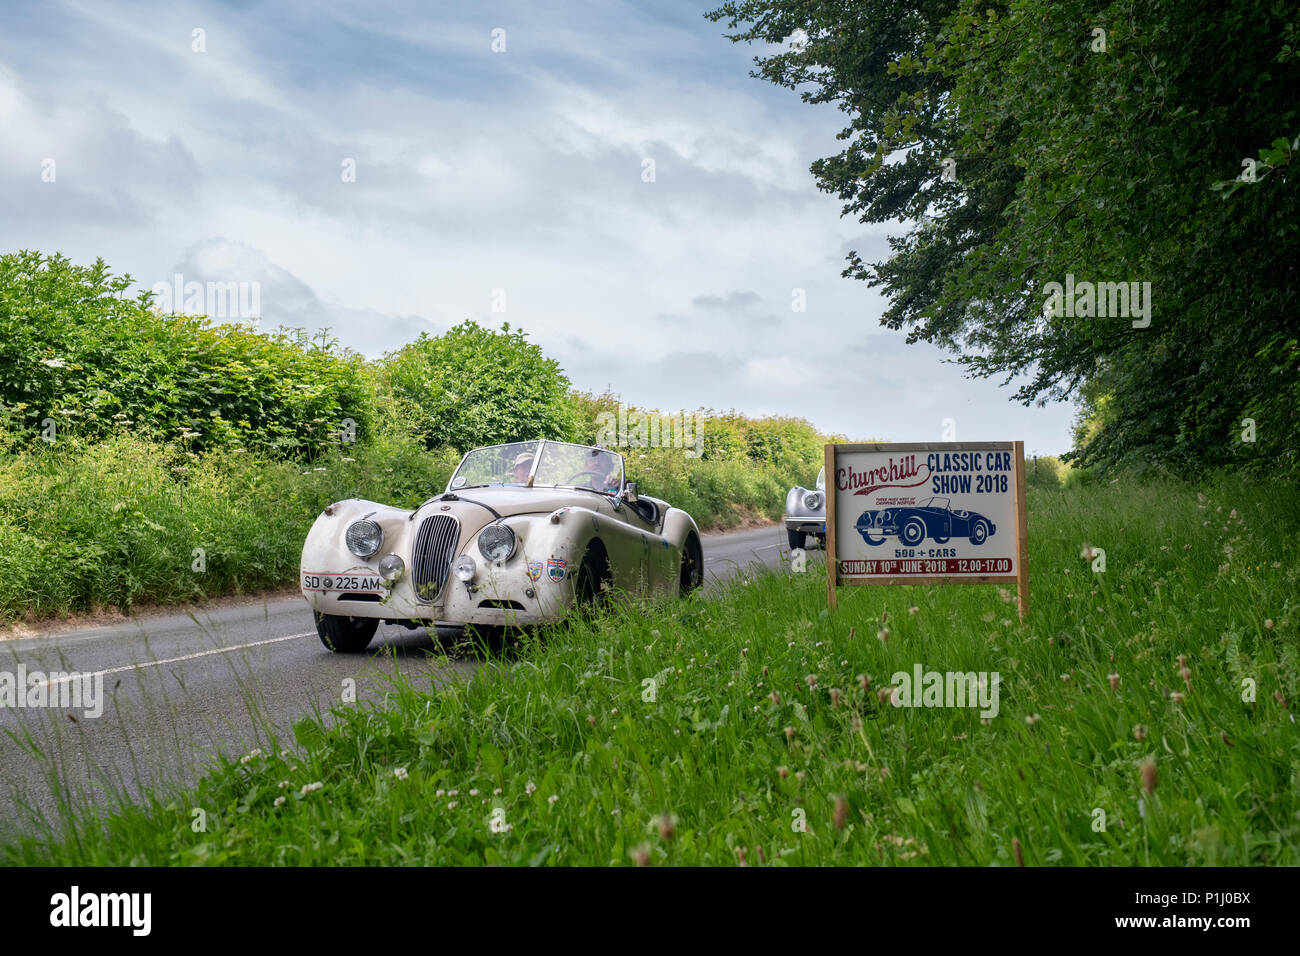 English Vintage Car Shows Stock Photos English Vintage Car Shows - When is the next car show near me